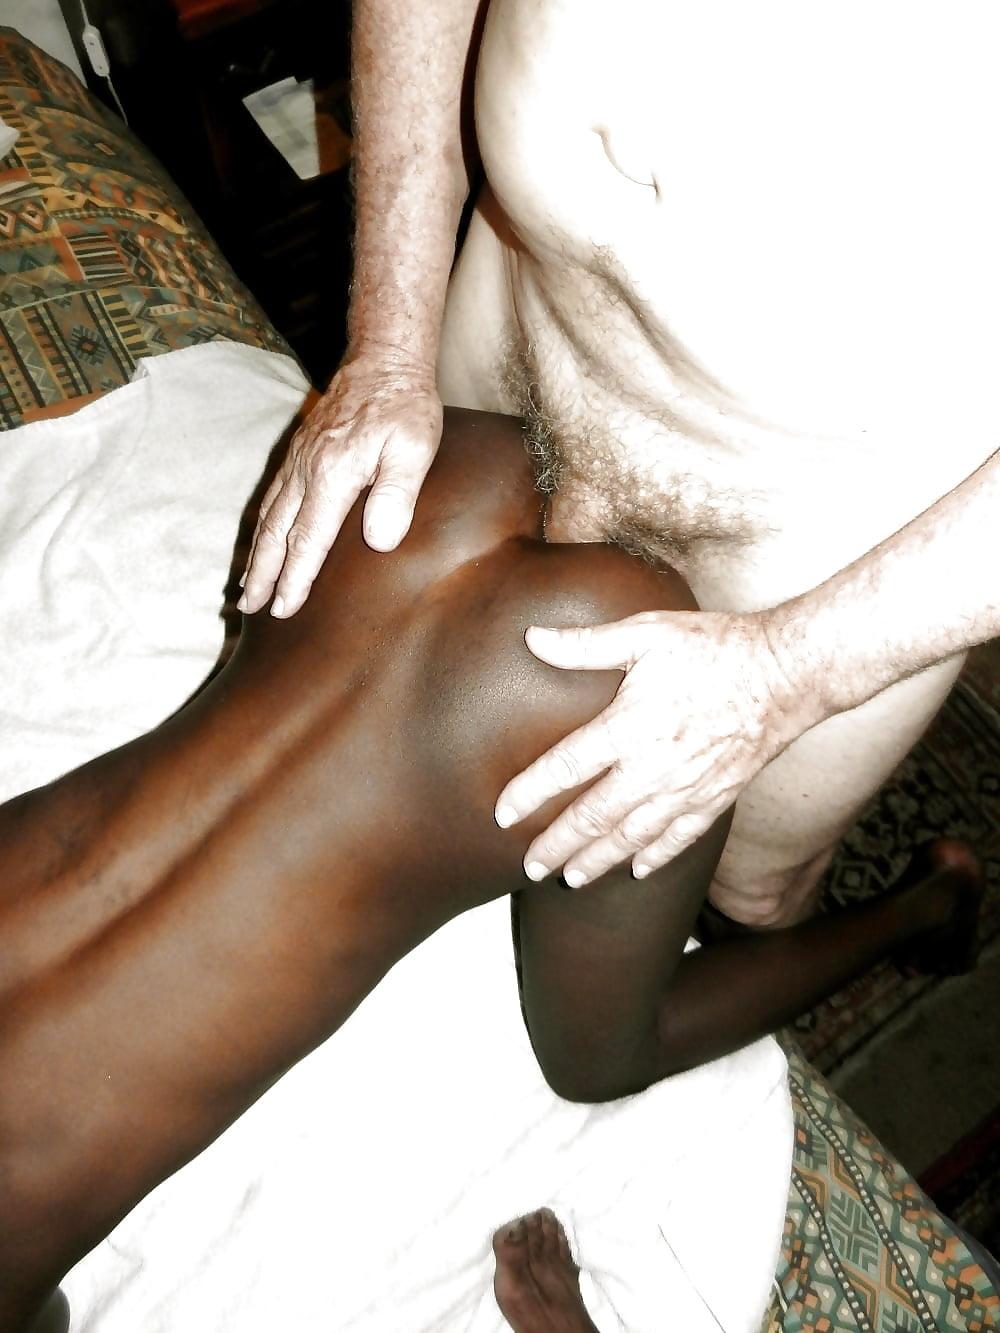 Congo sex videos — 1